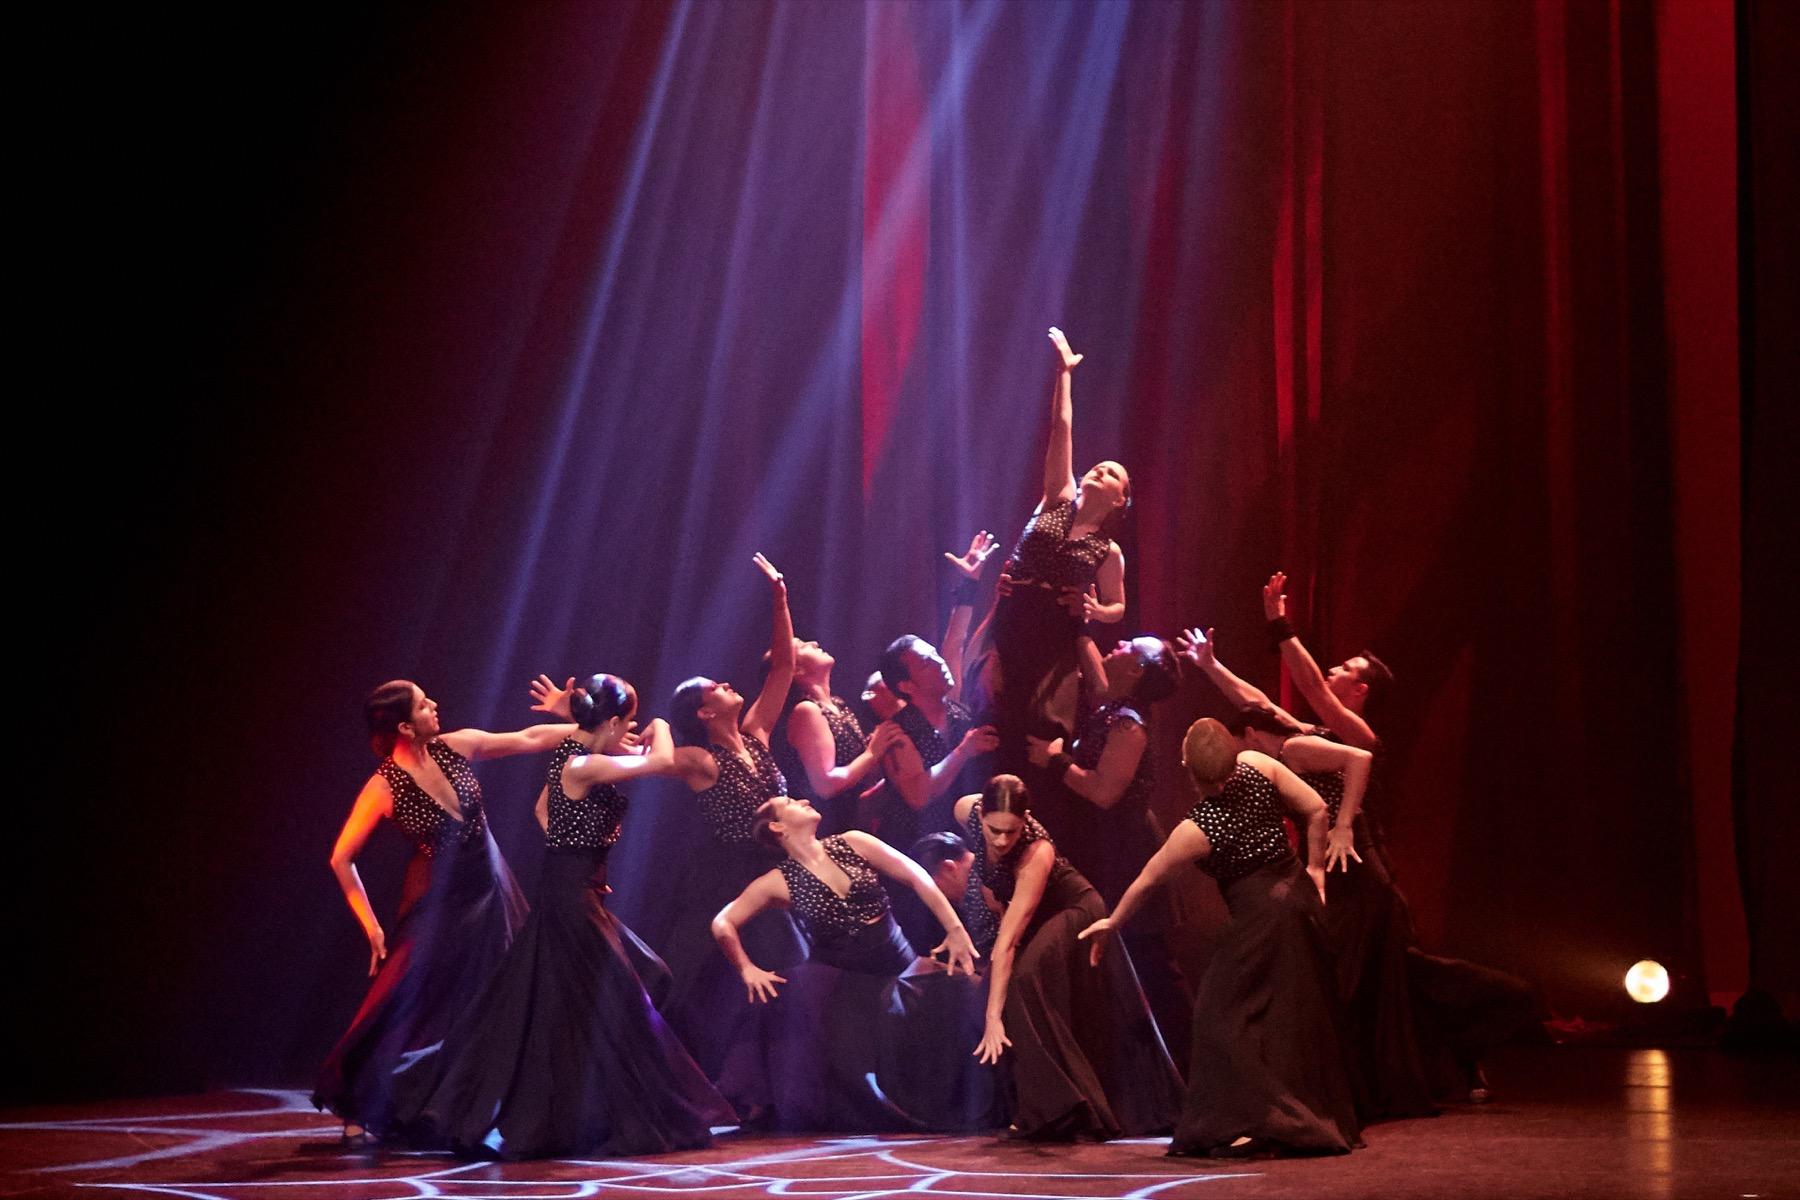 Ensemble Español Spanish Dance Theater/Cerqua Rivera Dance Theatre